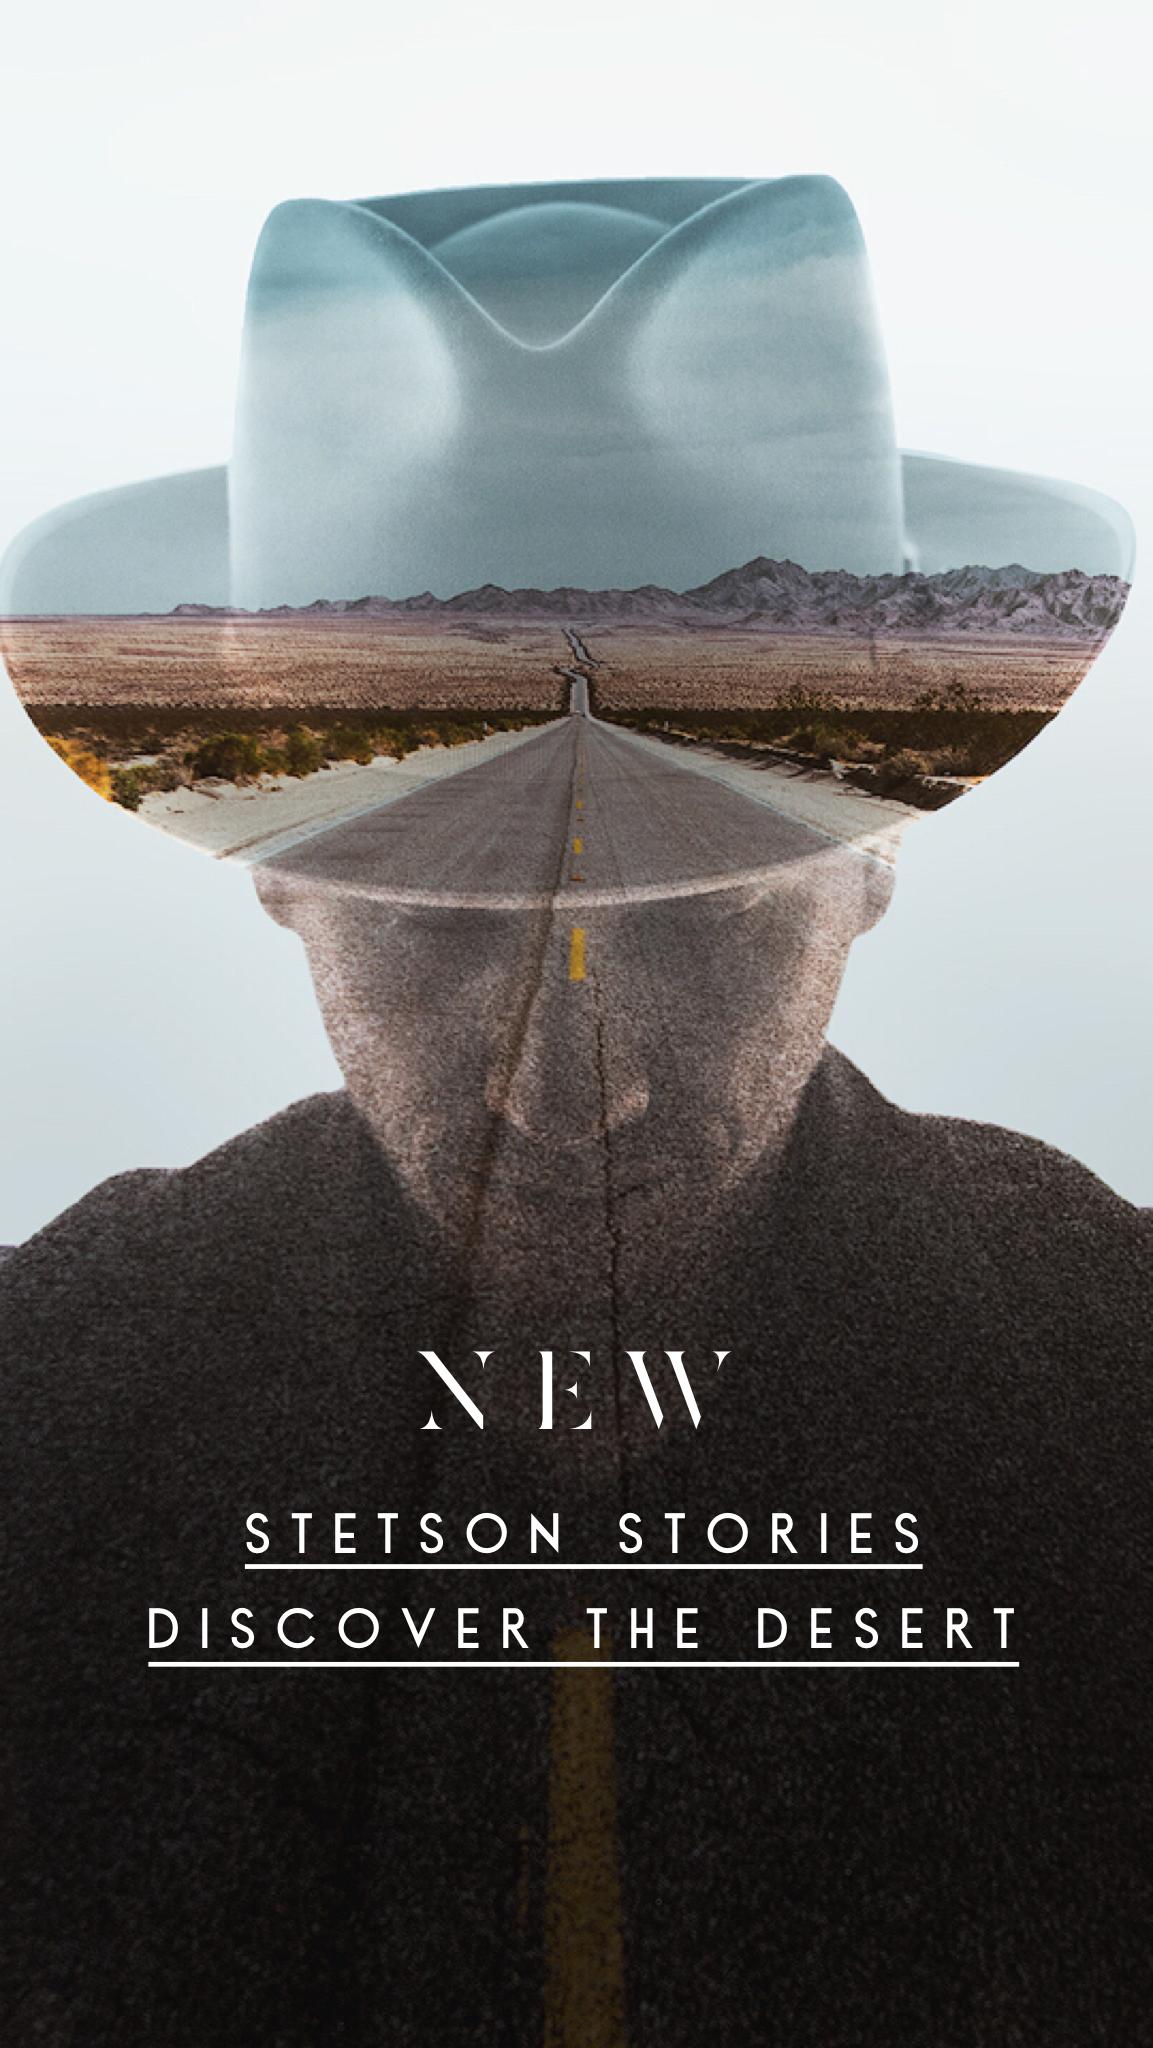 fd78e666d9f33 Discover the Desert with Stetson  itsastetson